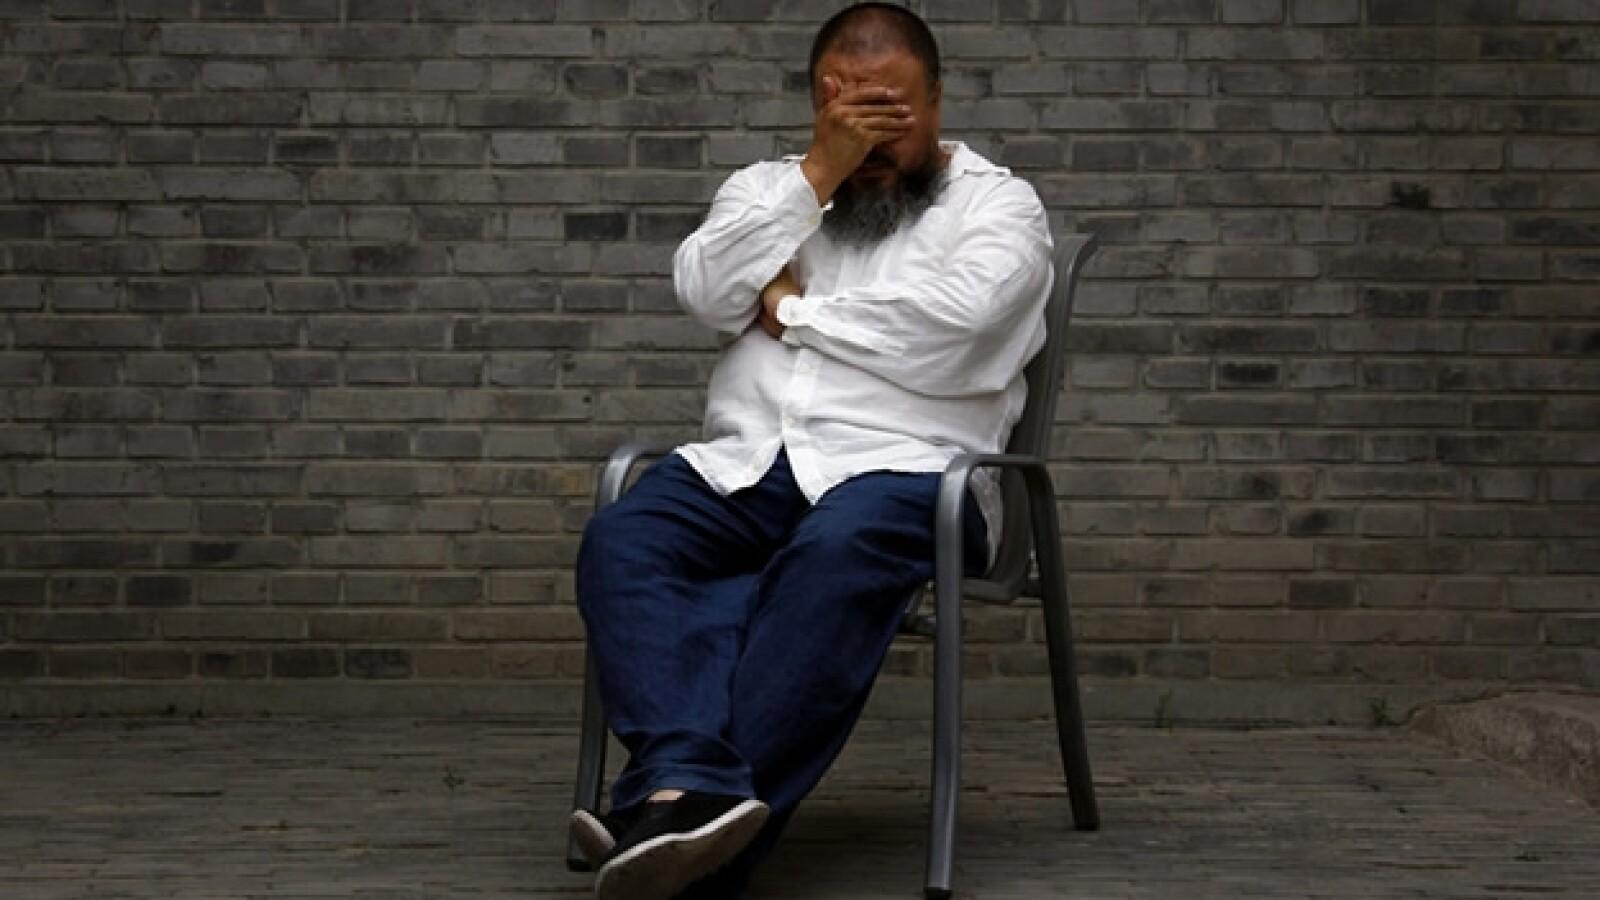 disidente chino, arquitecto